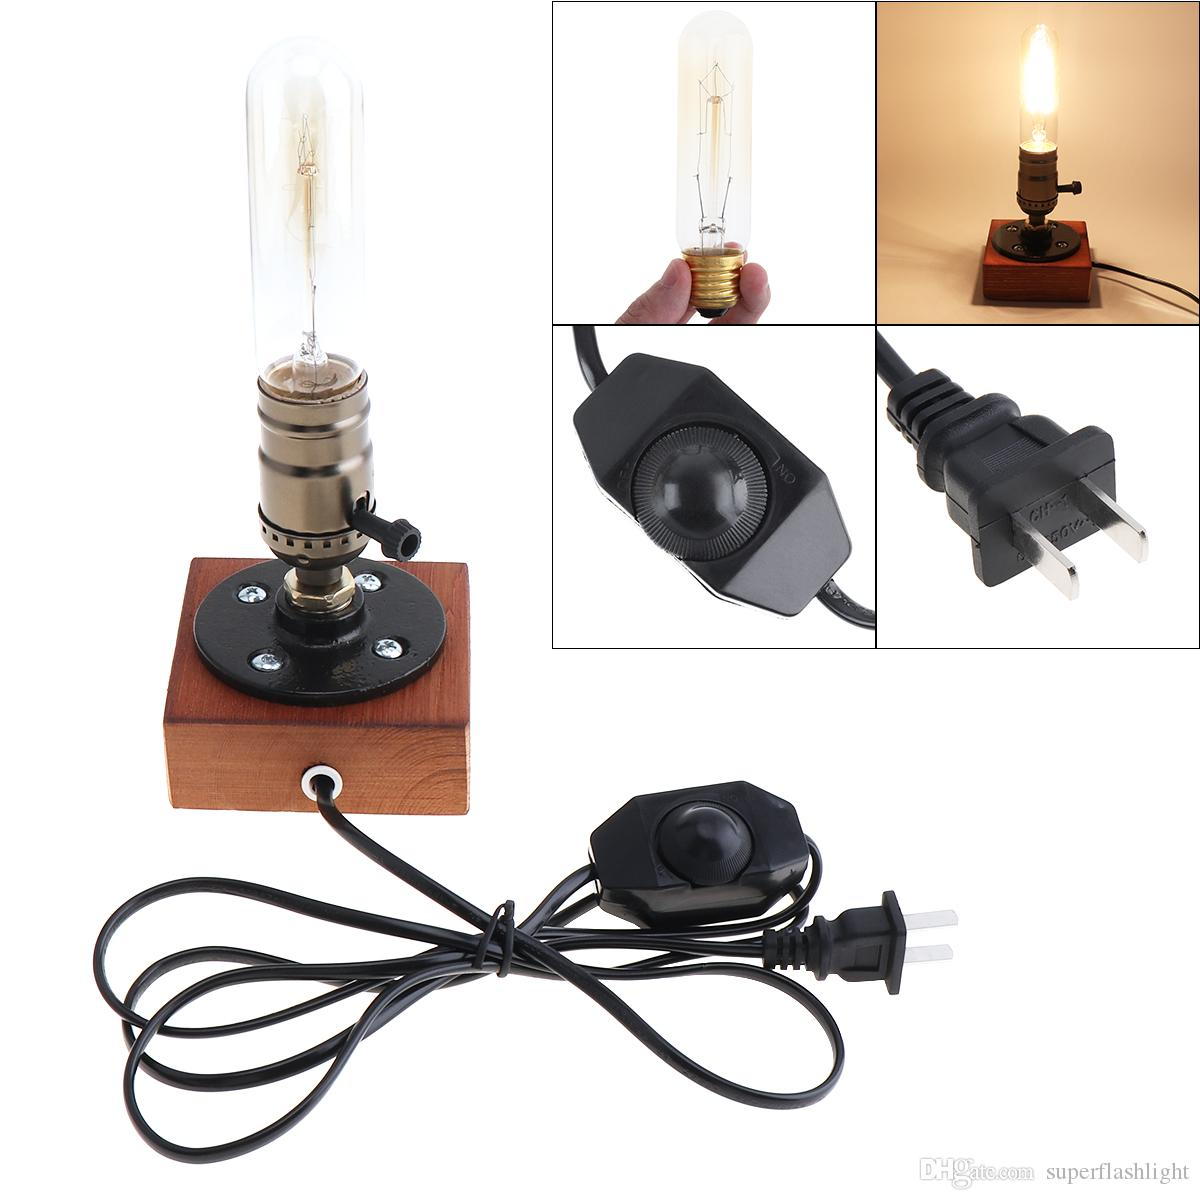 Retro Style Vintage Industrial Single Socket Table Bedside Desk Lamp Wooden Base Creative Edison Light Bulb Home Shop Decoration LEG_40E